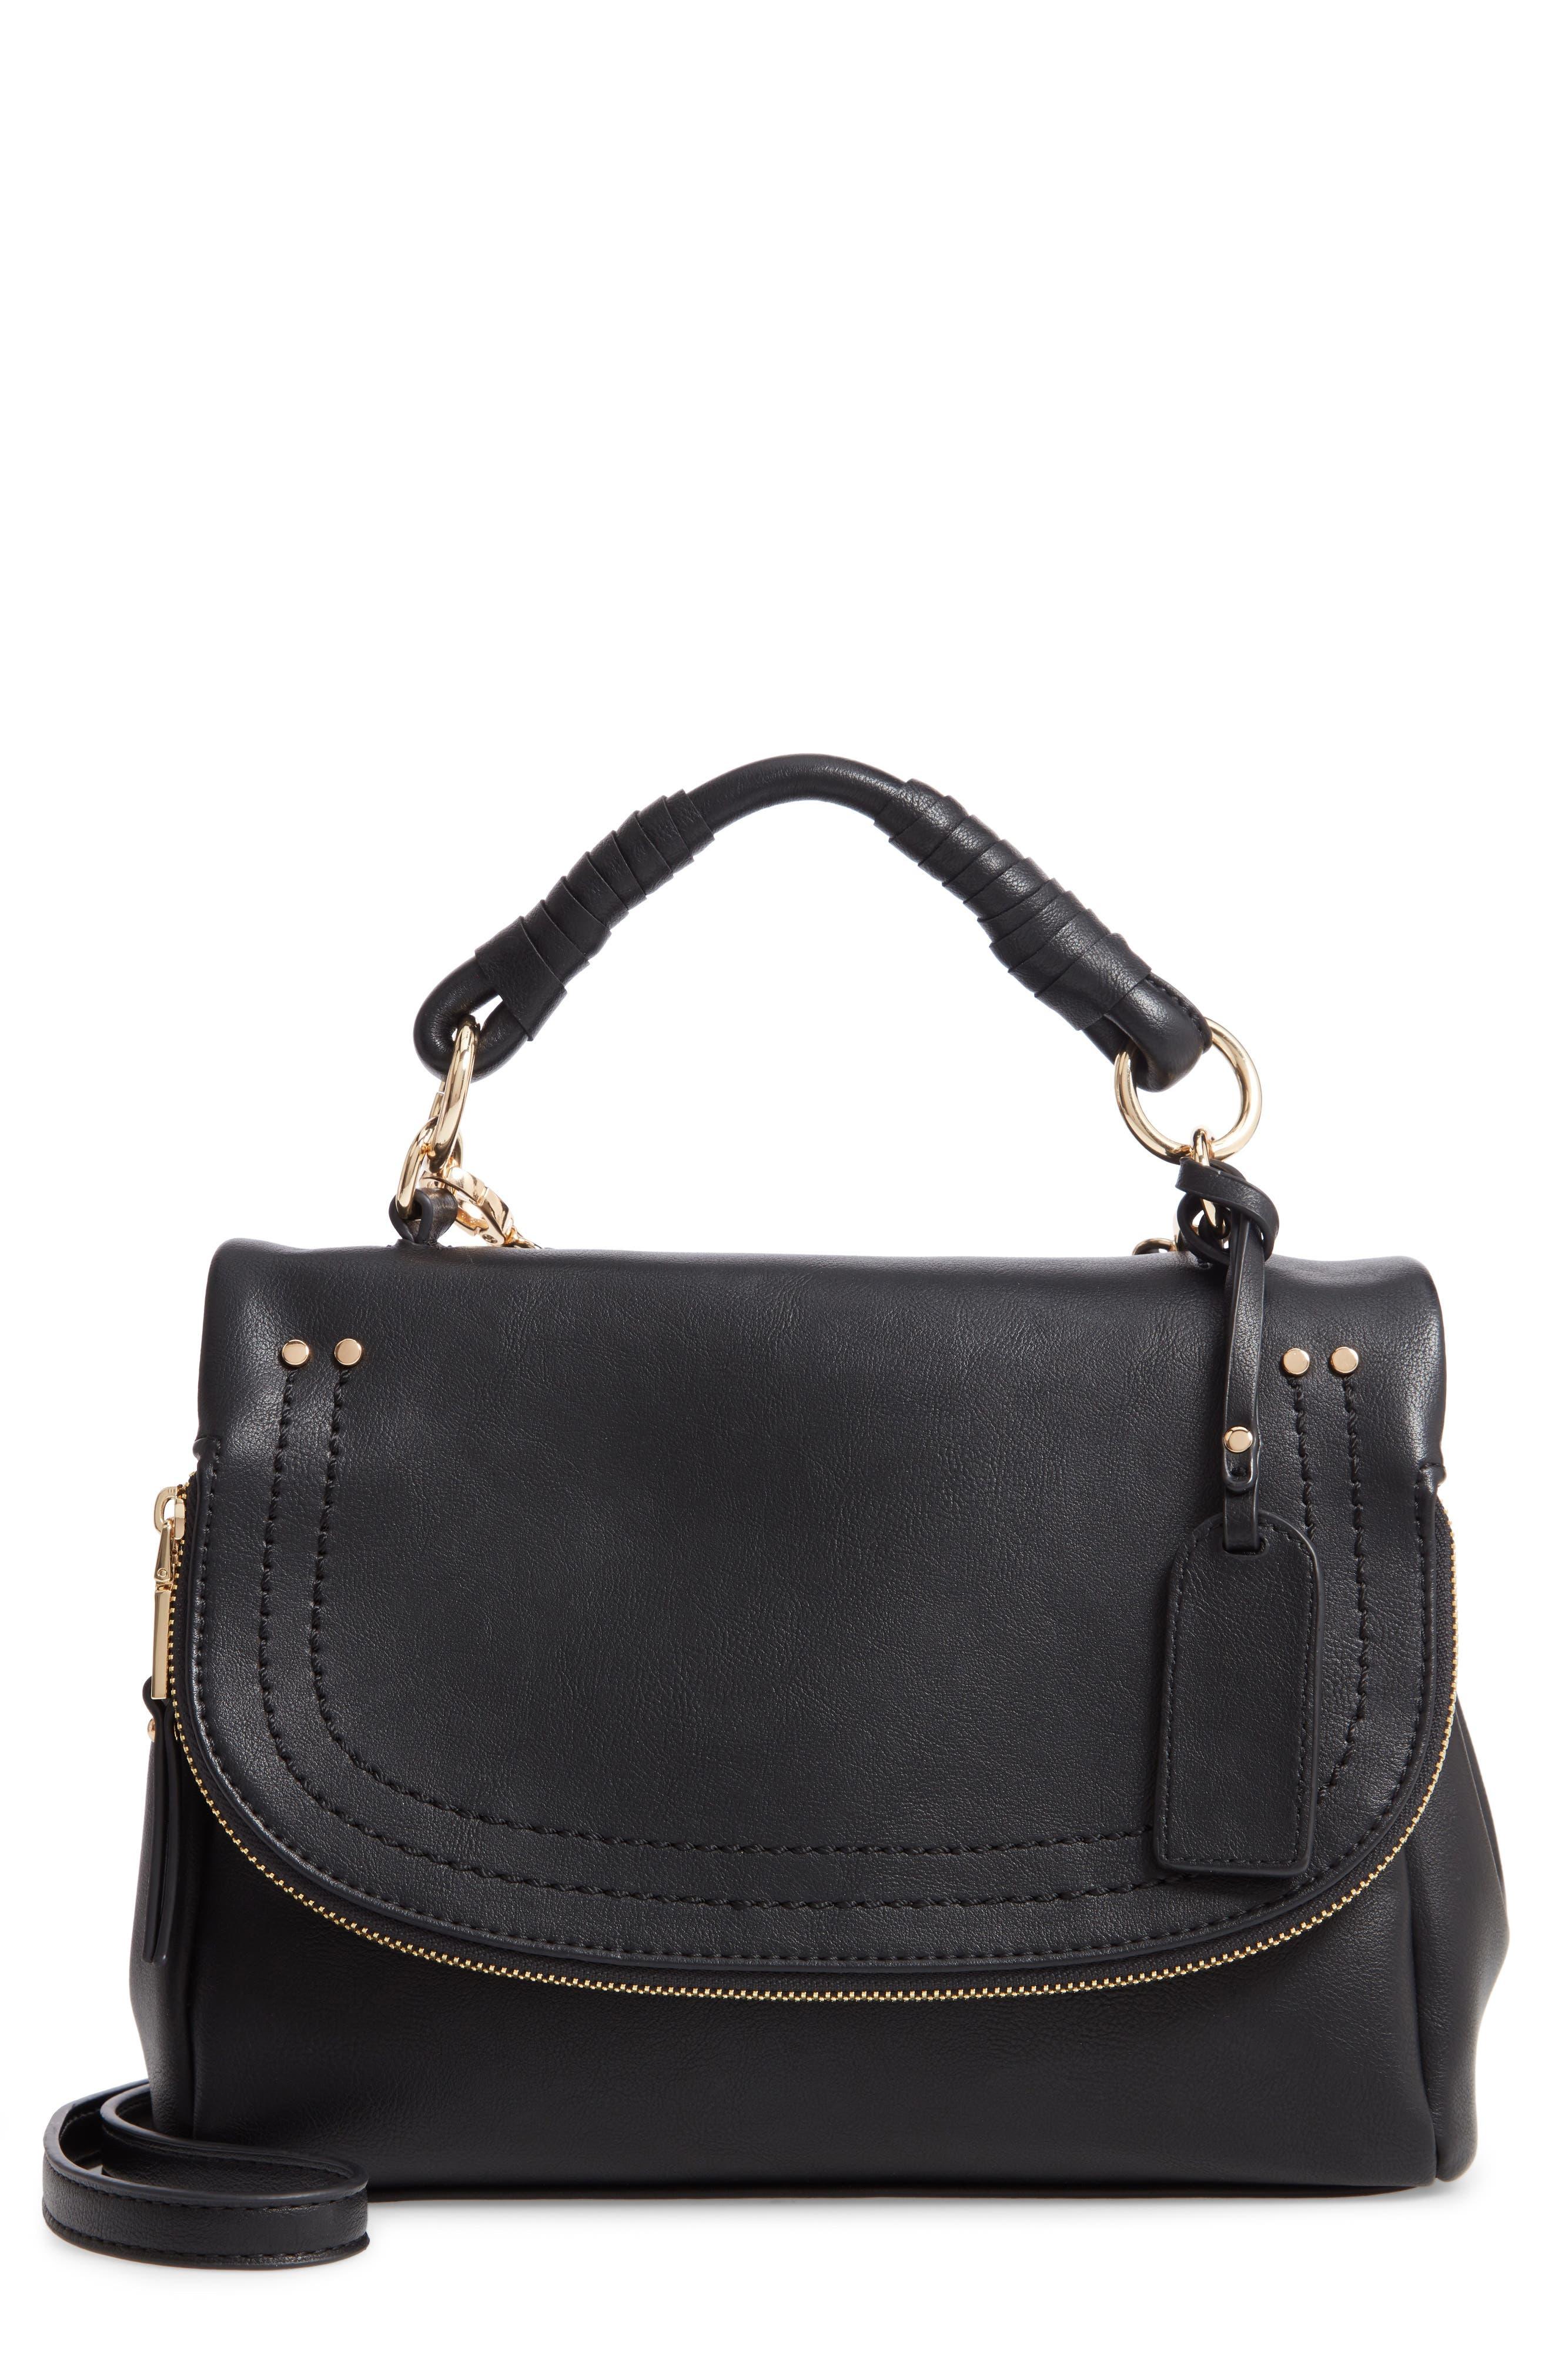 Rubie Faux Leather Crossbody Bag,                         Main,                         color, BLACK